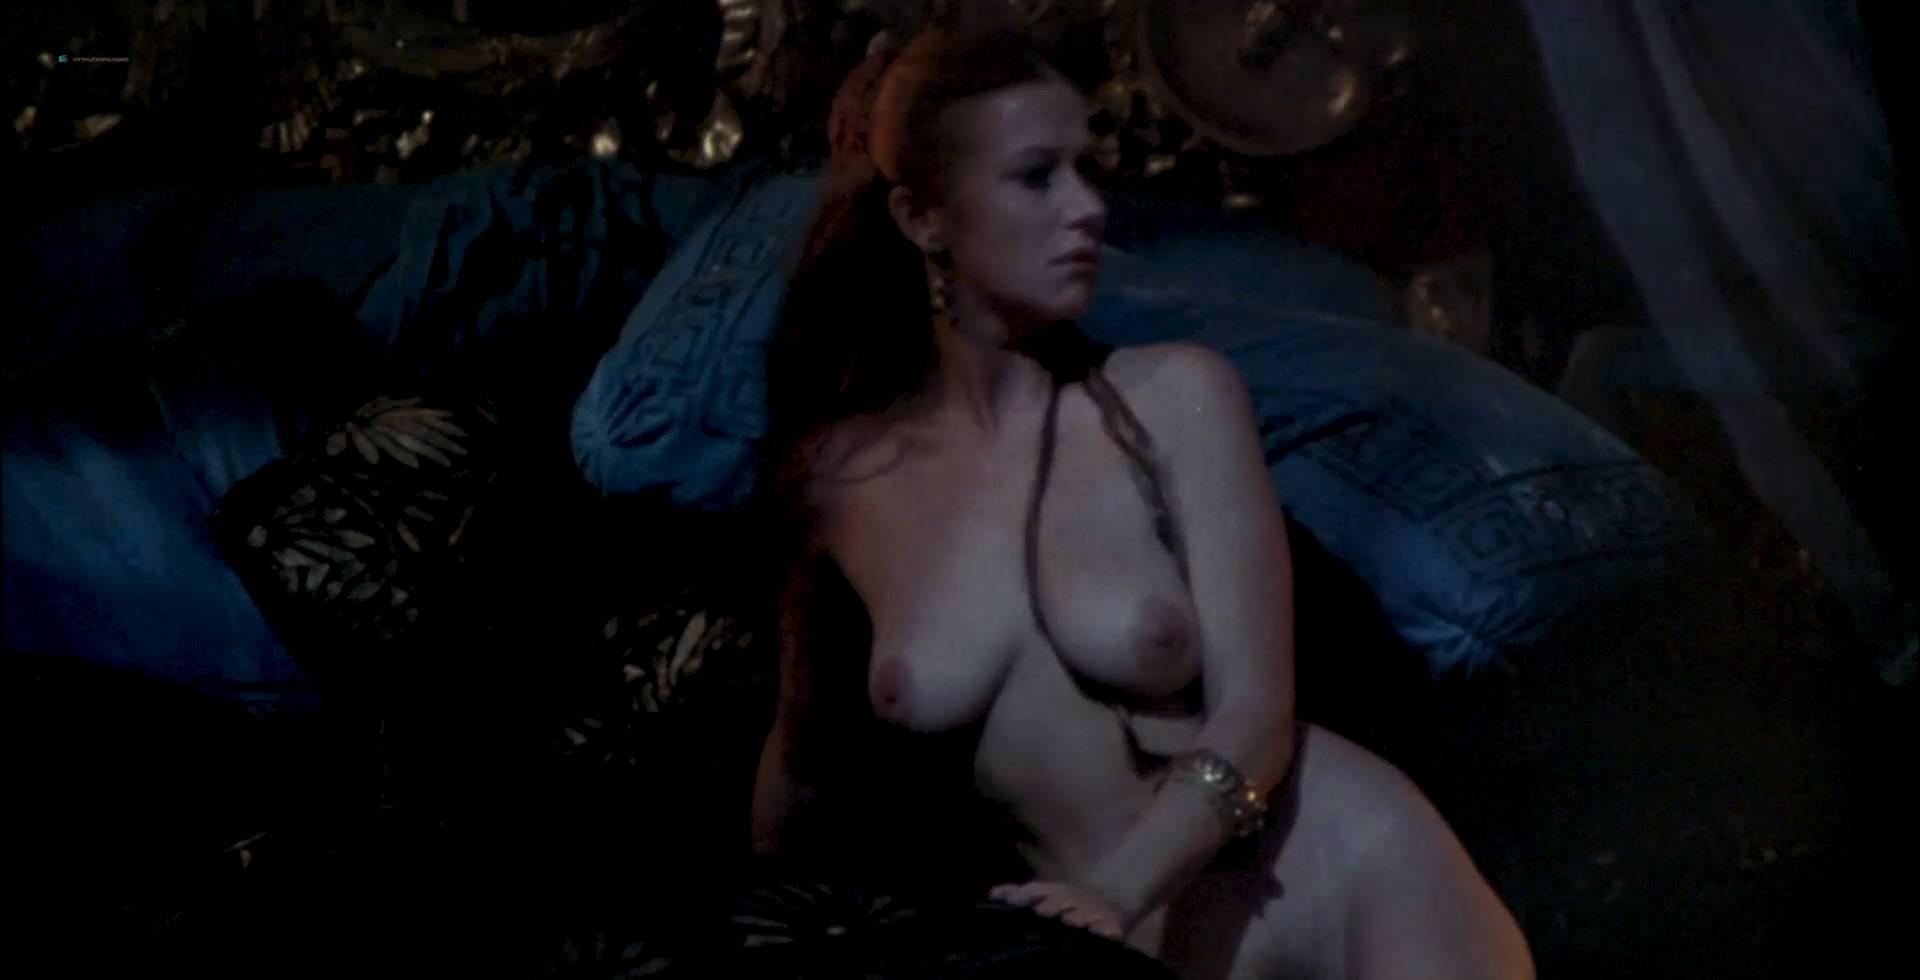 helen-mirren-nude-bra-cousin-blowjob-me